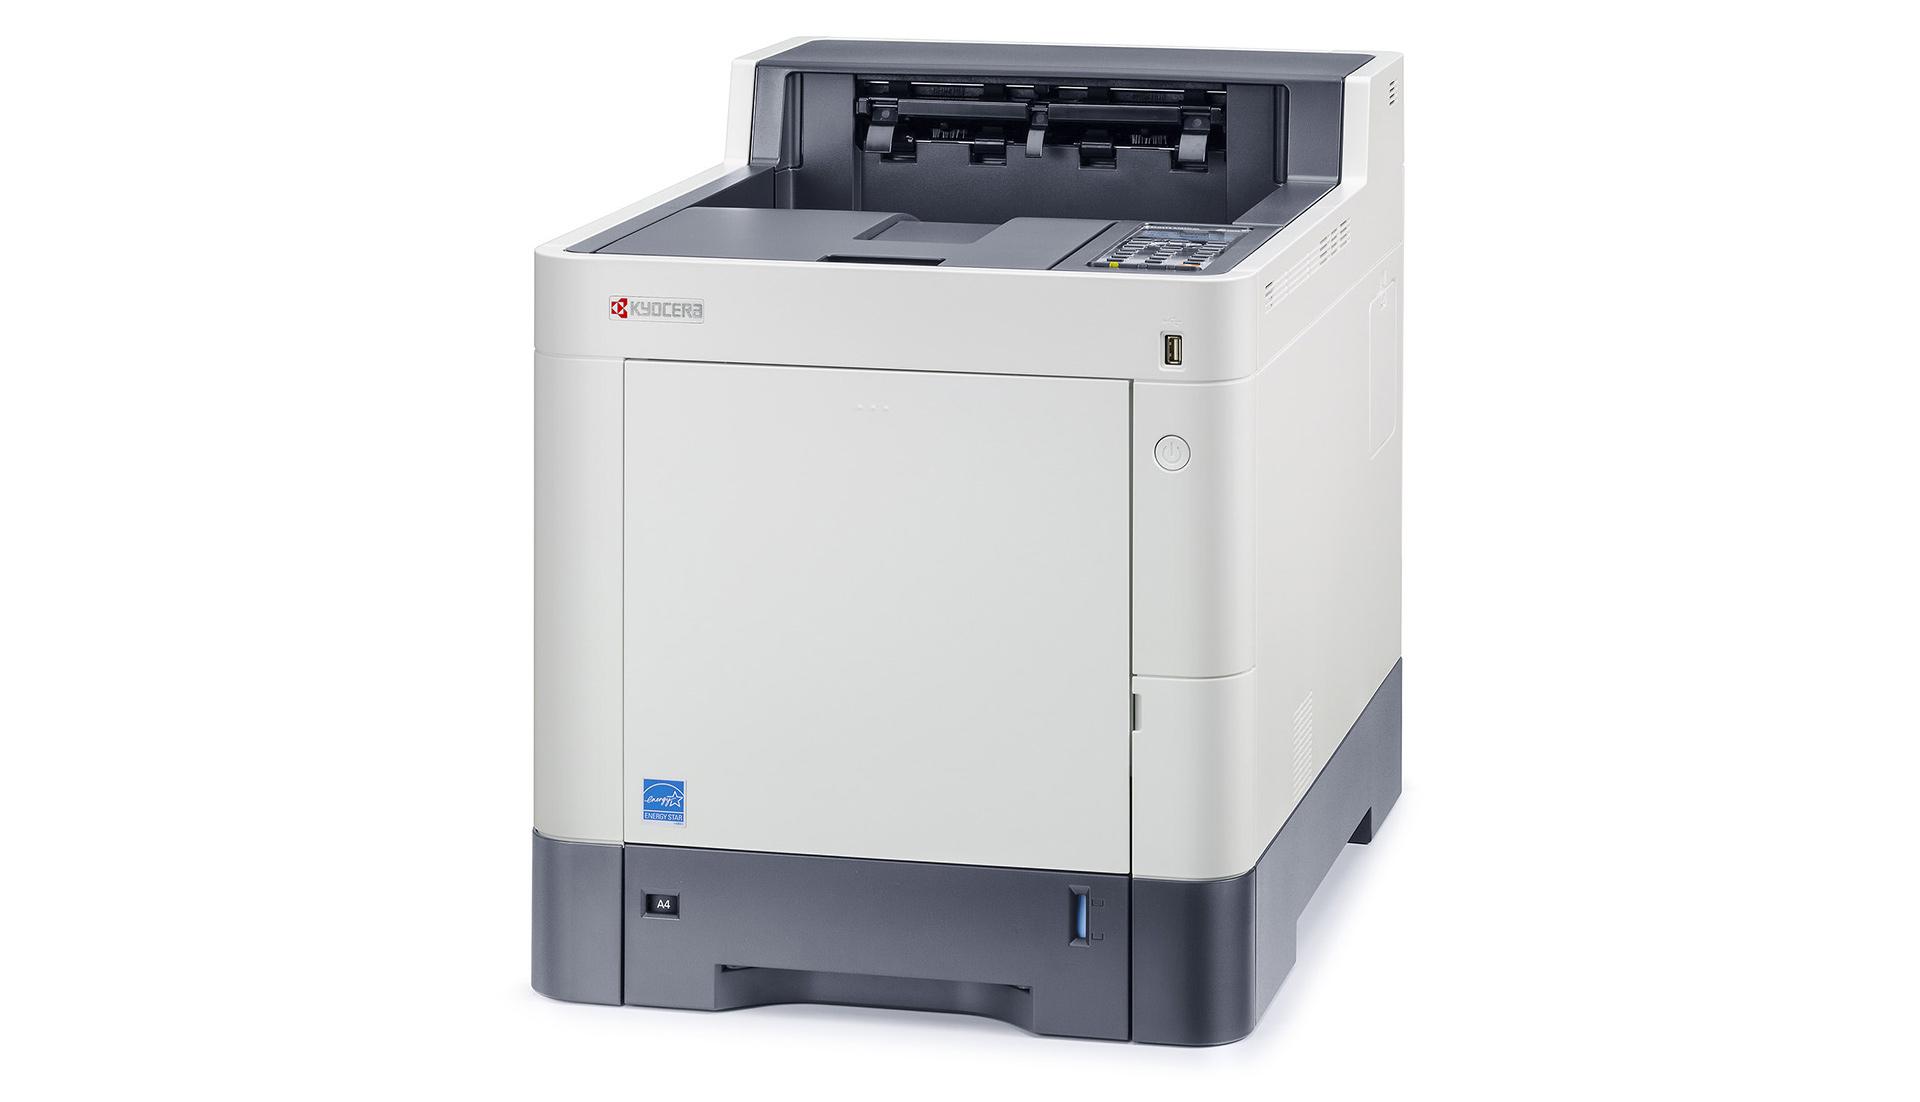 Impressora Kyocera Ecosys P 6035CDN/7040CDN